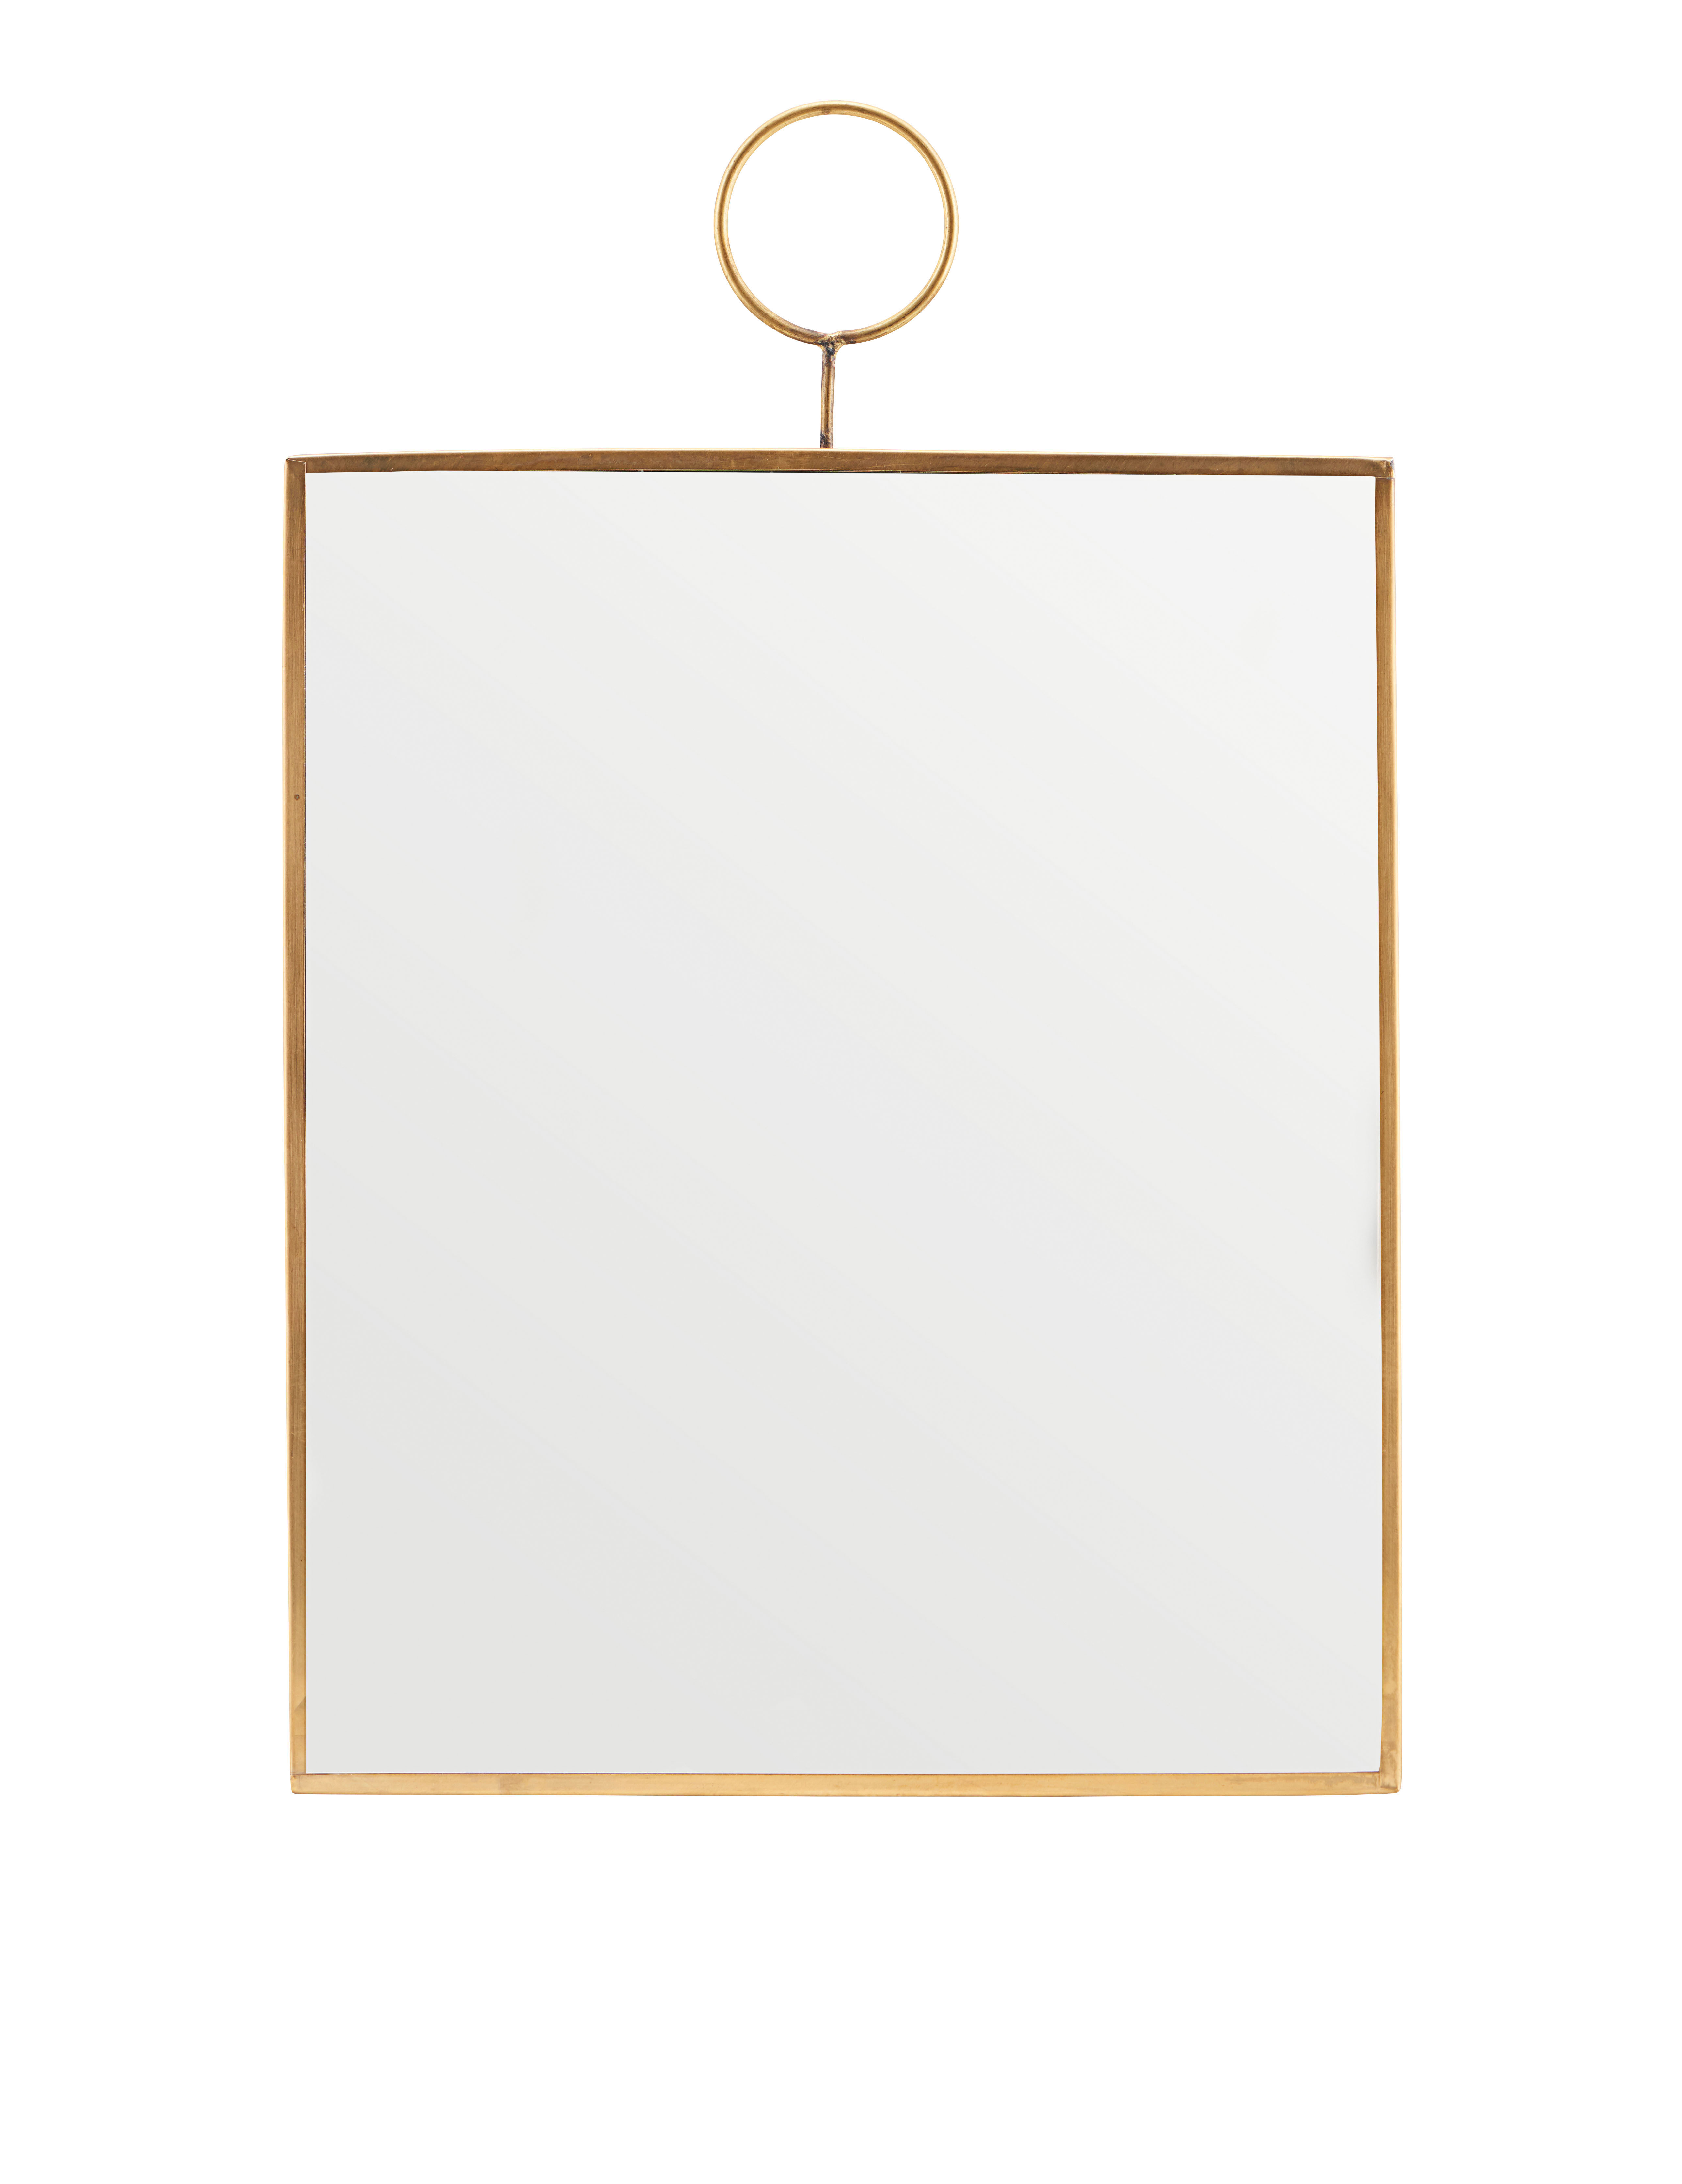 Déco - Miroirs - Miroir mural The Loop / Laiton - 25 x 30 cm - House Doctor - 25 x 30 cm / Laiton - Laiton, Miroir